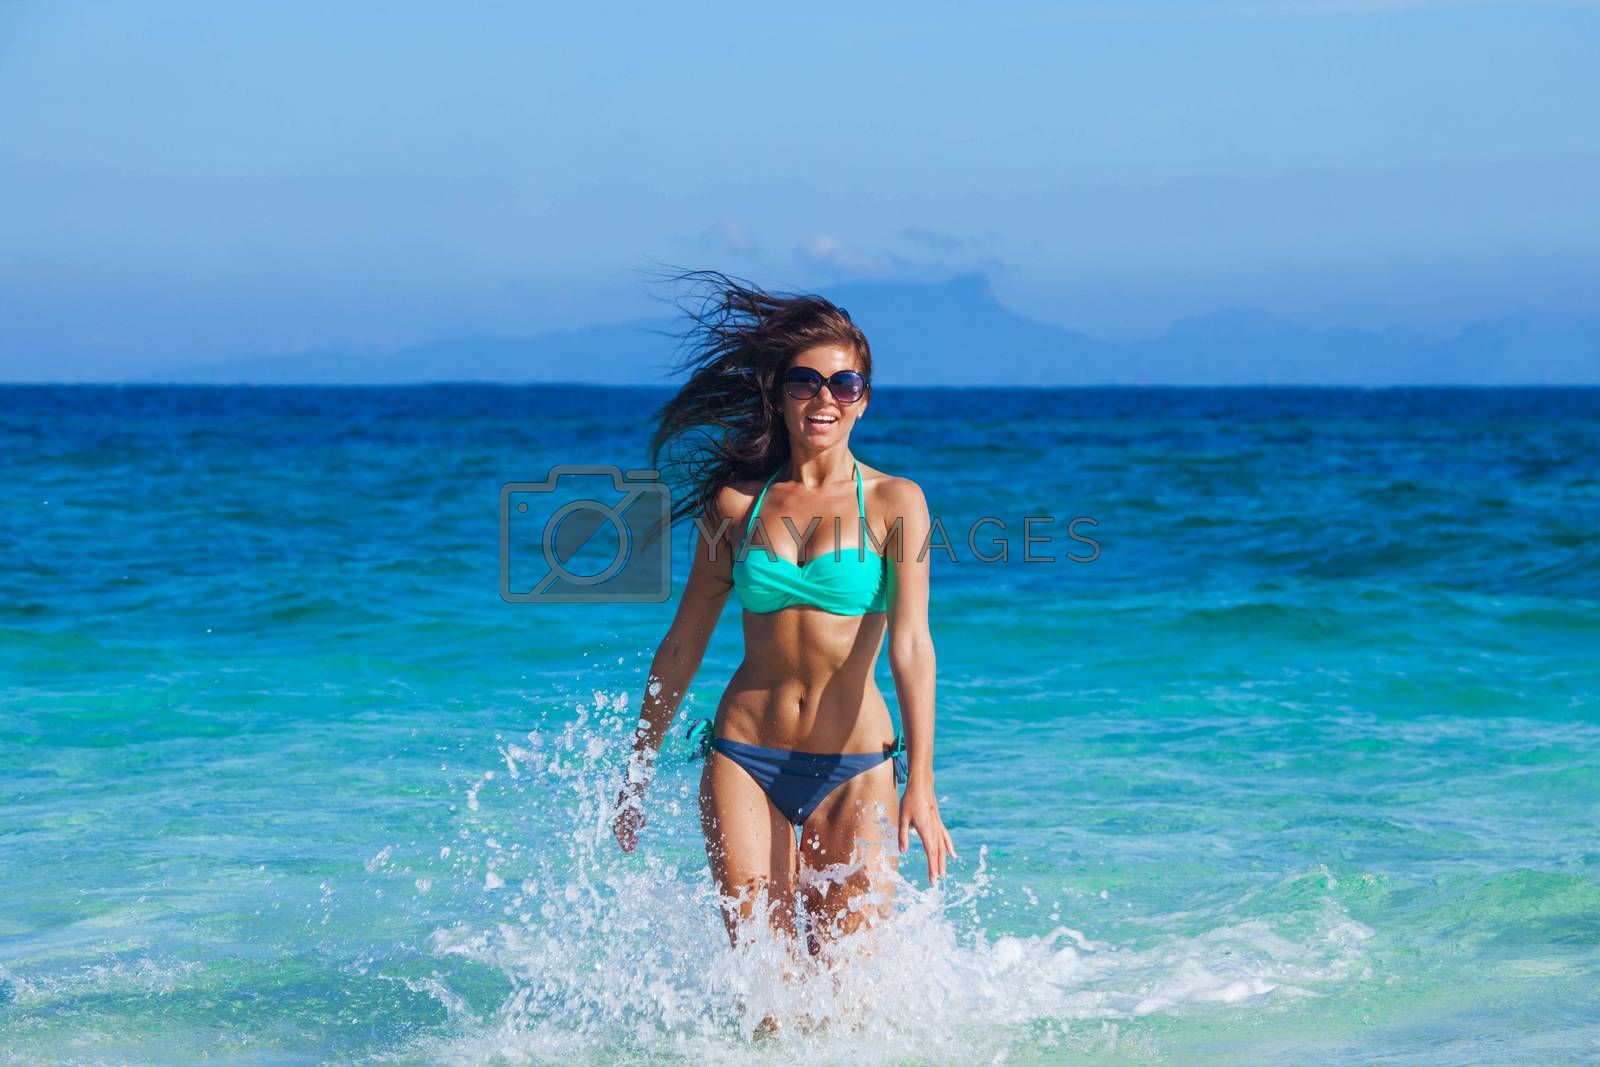 Beautiful happy girl in bikini and sunglasses running in tropical sea waves